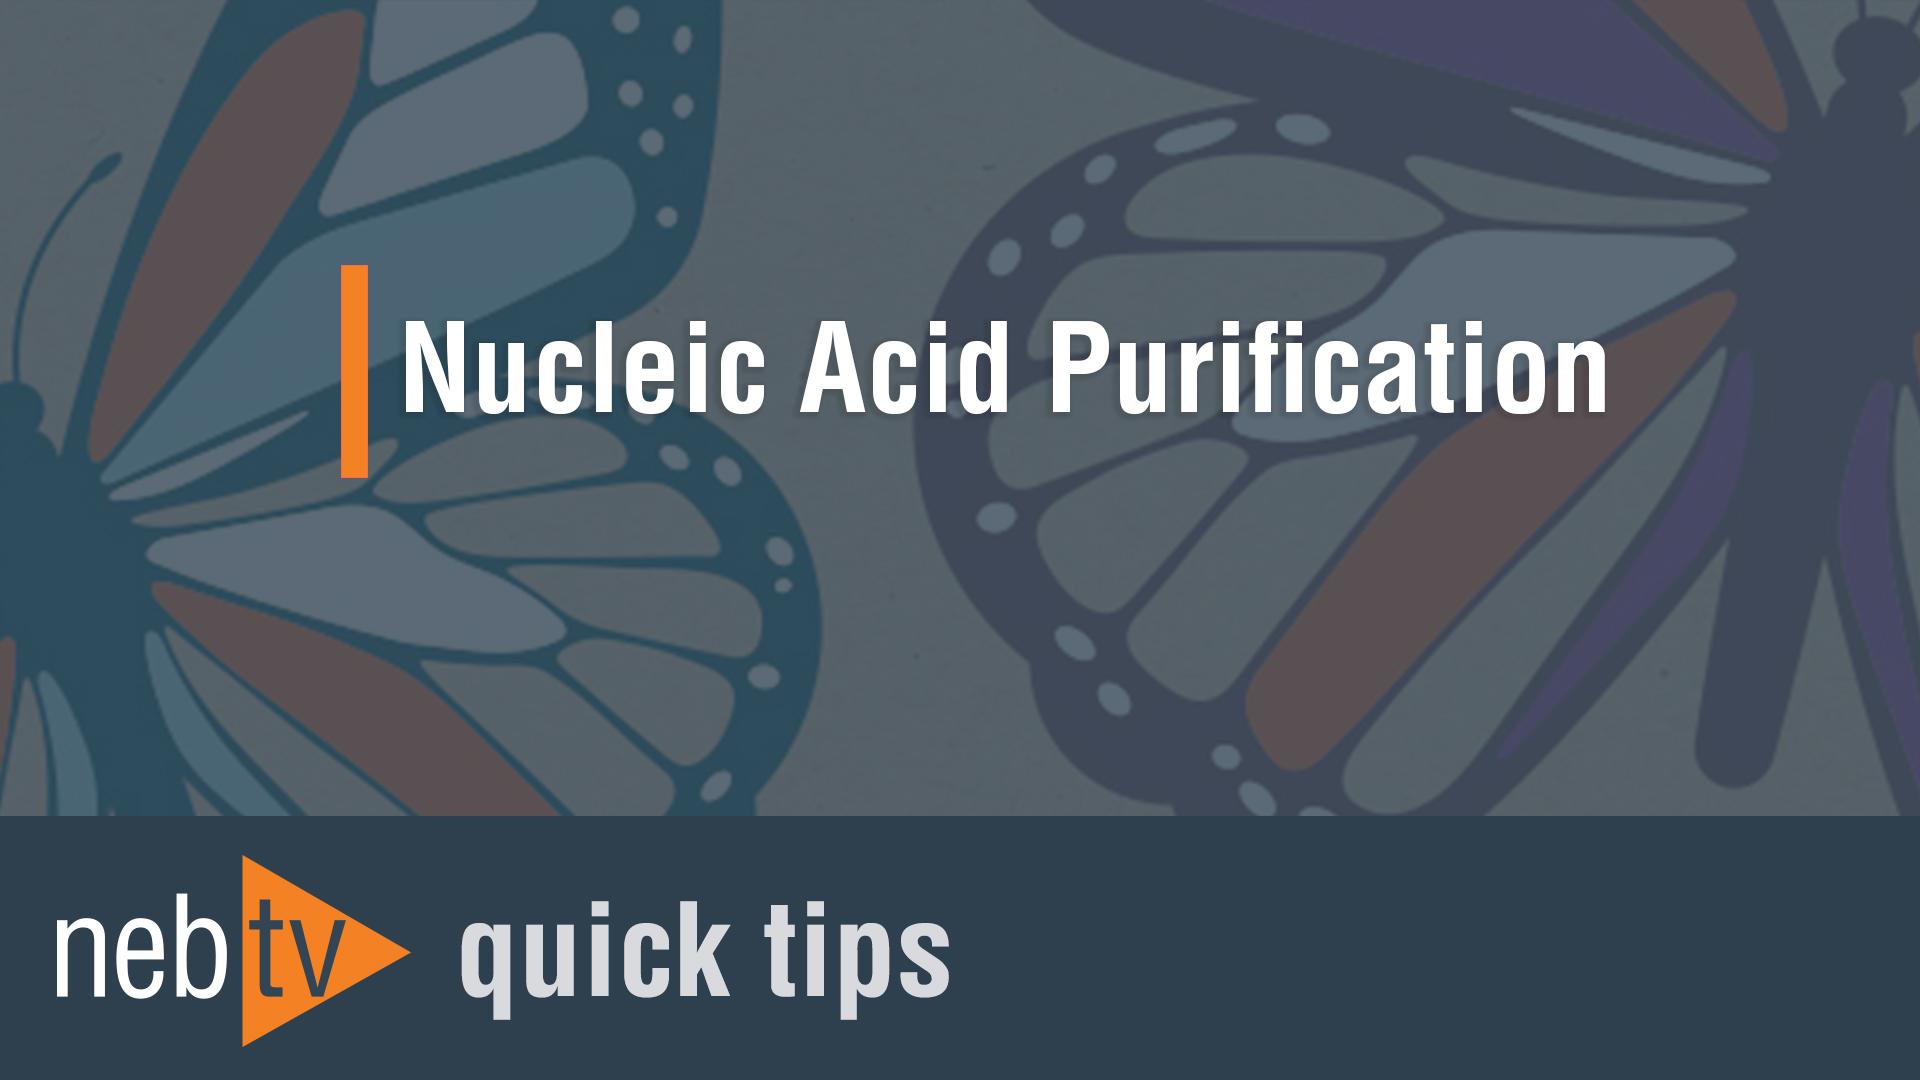 NEBTV_Nucleic-Acid-Purificatio_1920